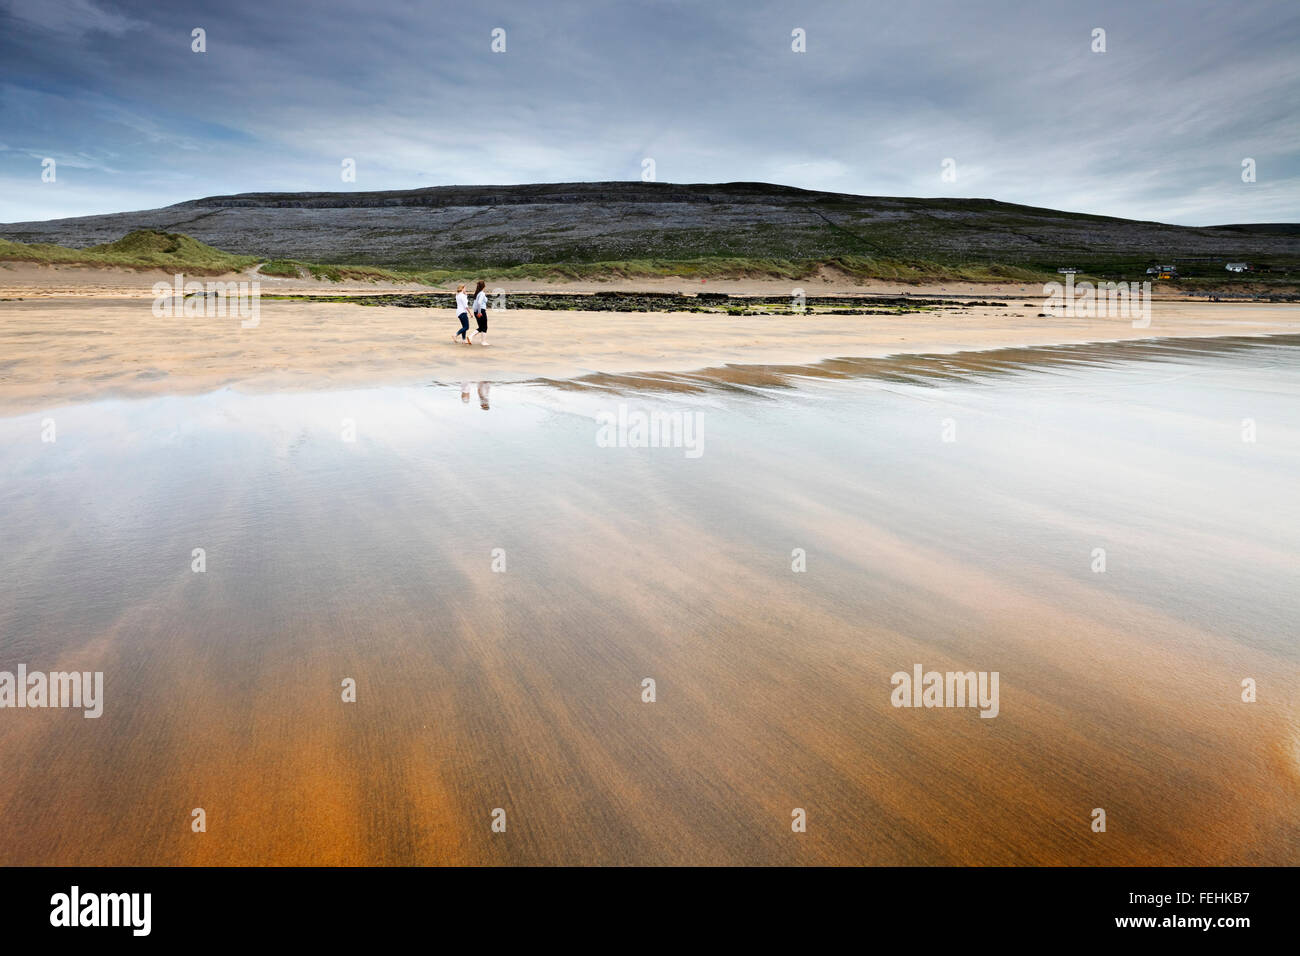 Fanore Beach in the Burren region, County Clare, Ireland - Stock Image